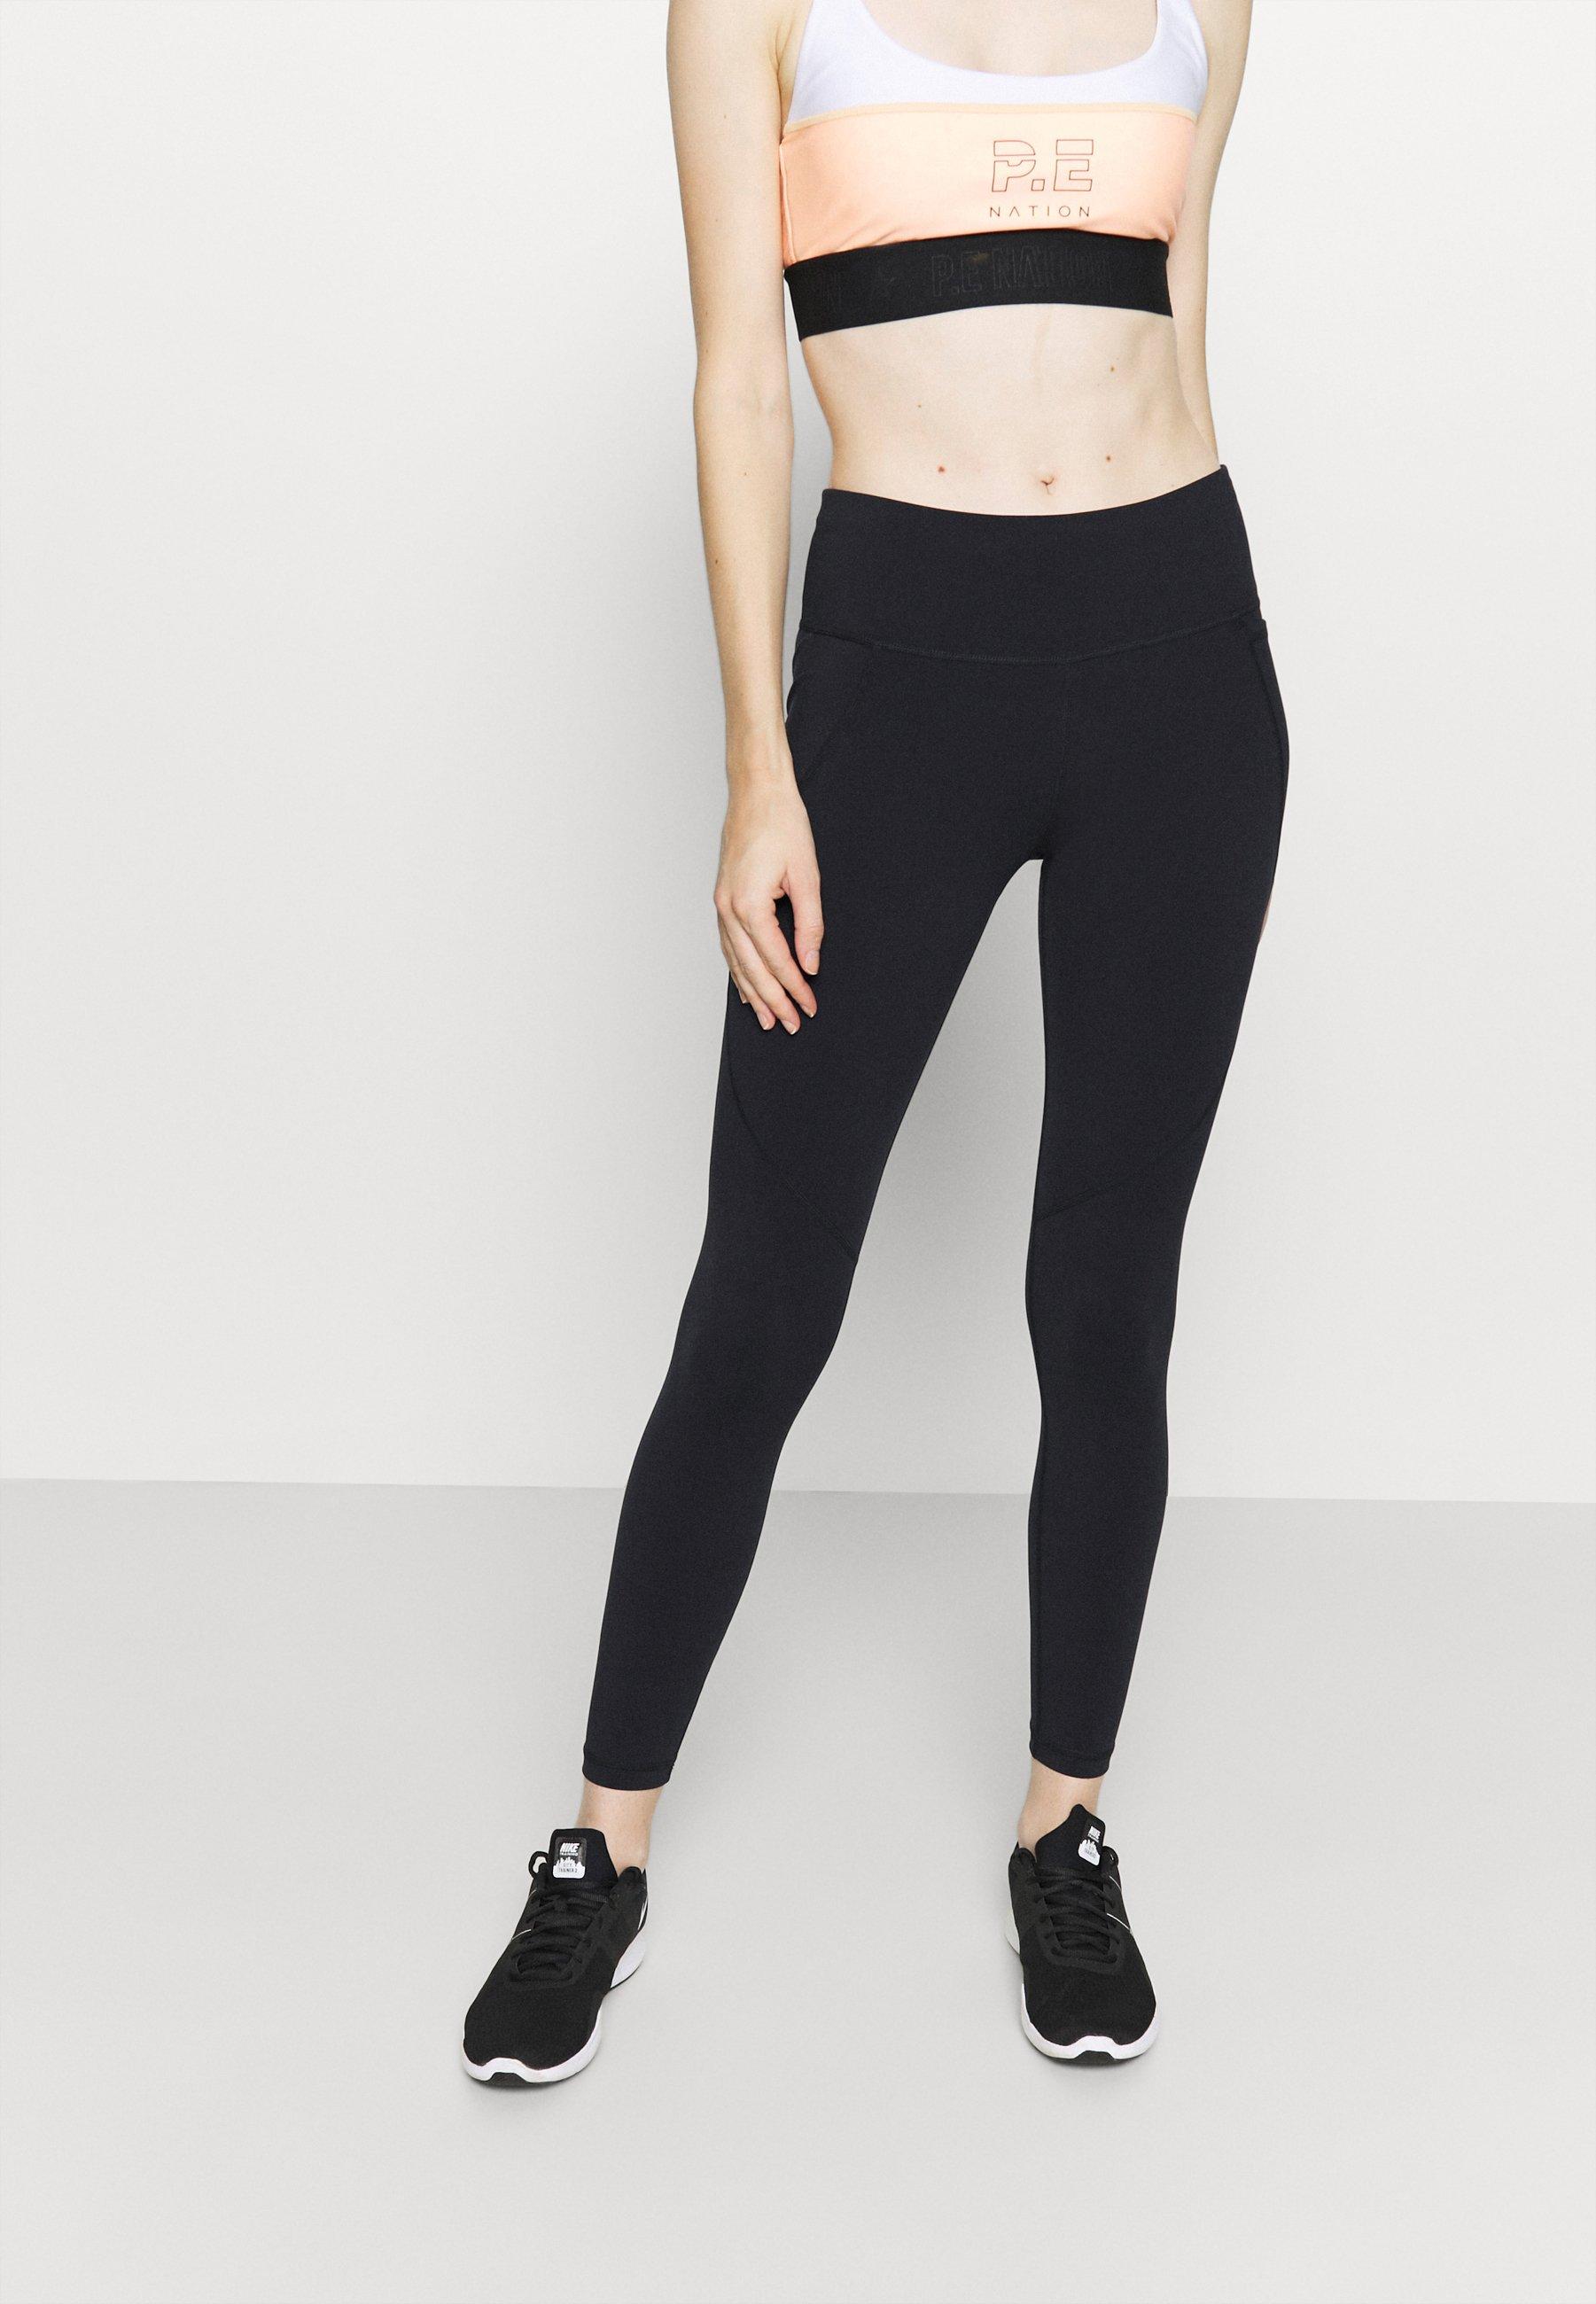 Femme POWER WORKOUT LEGGINGS - Collants